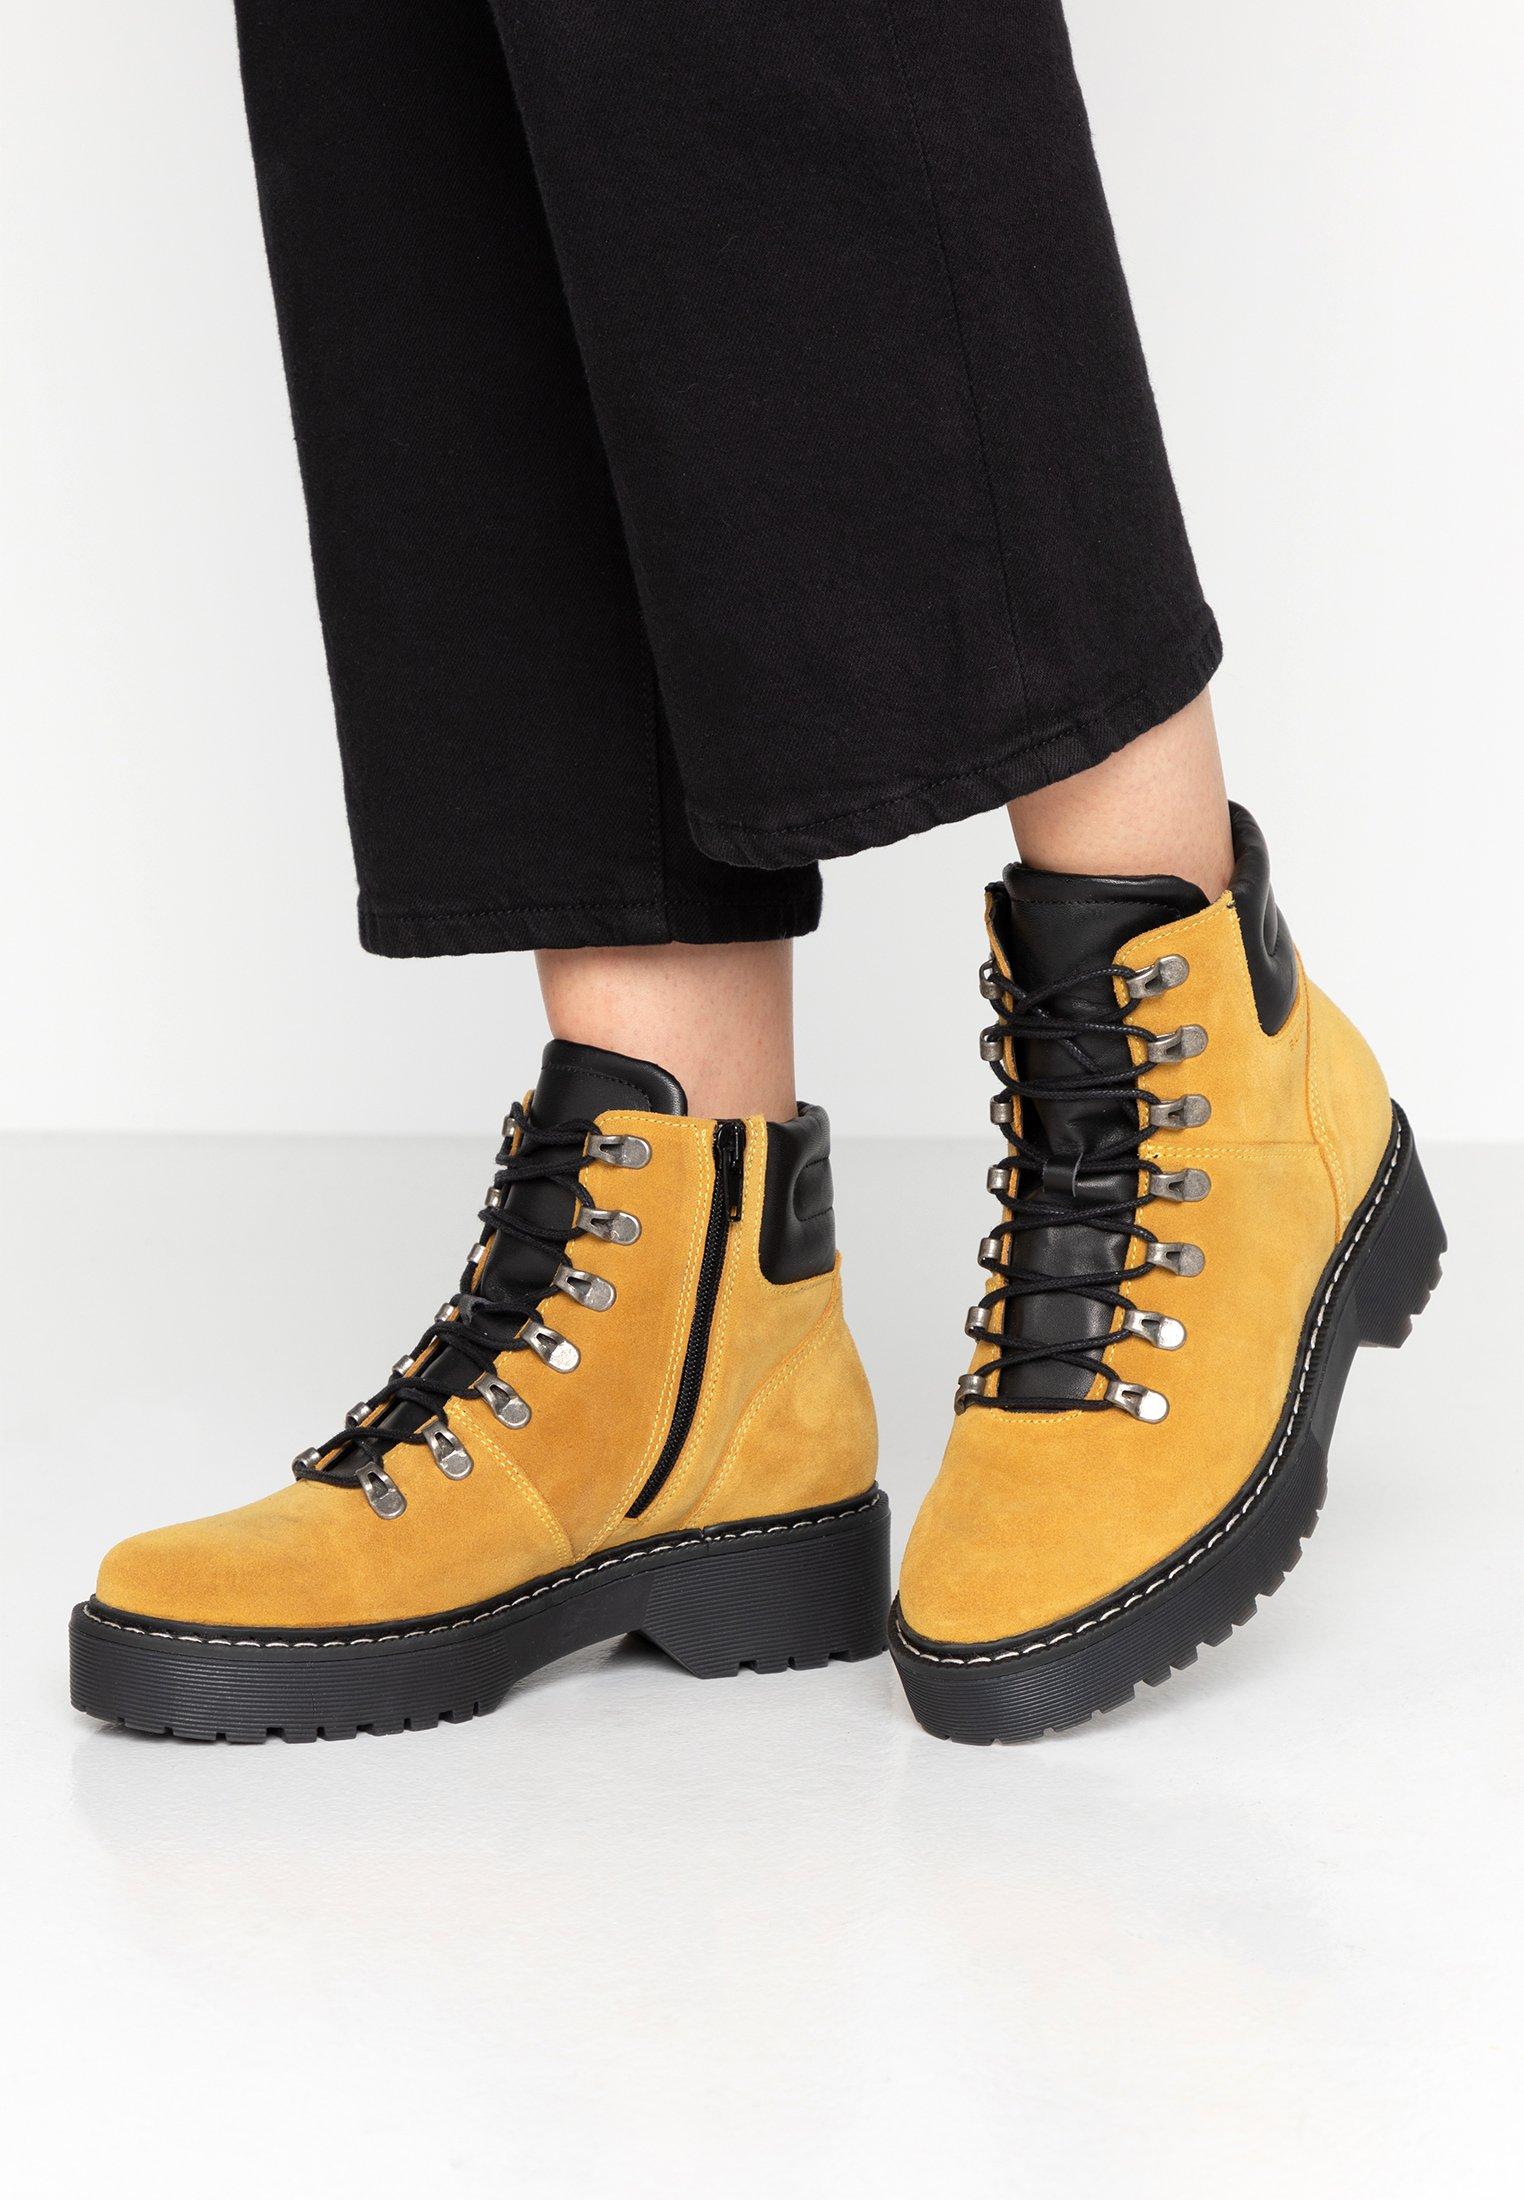 Bullboxer Boots Boots À TalonsYellow À TalonsYellow À Bullboxer TalonsYellow Boots Bullboxer wN8nm0